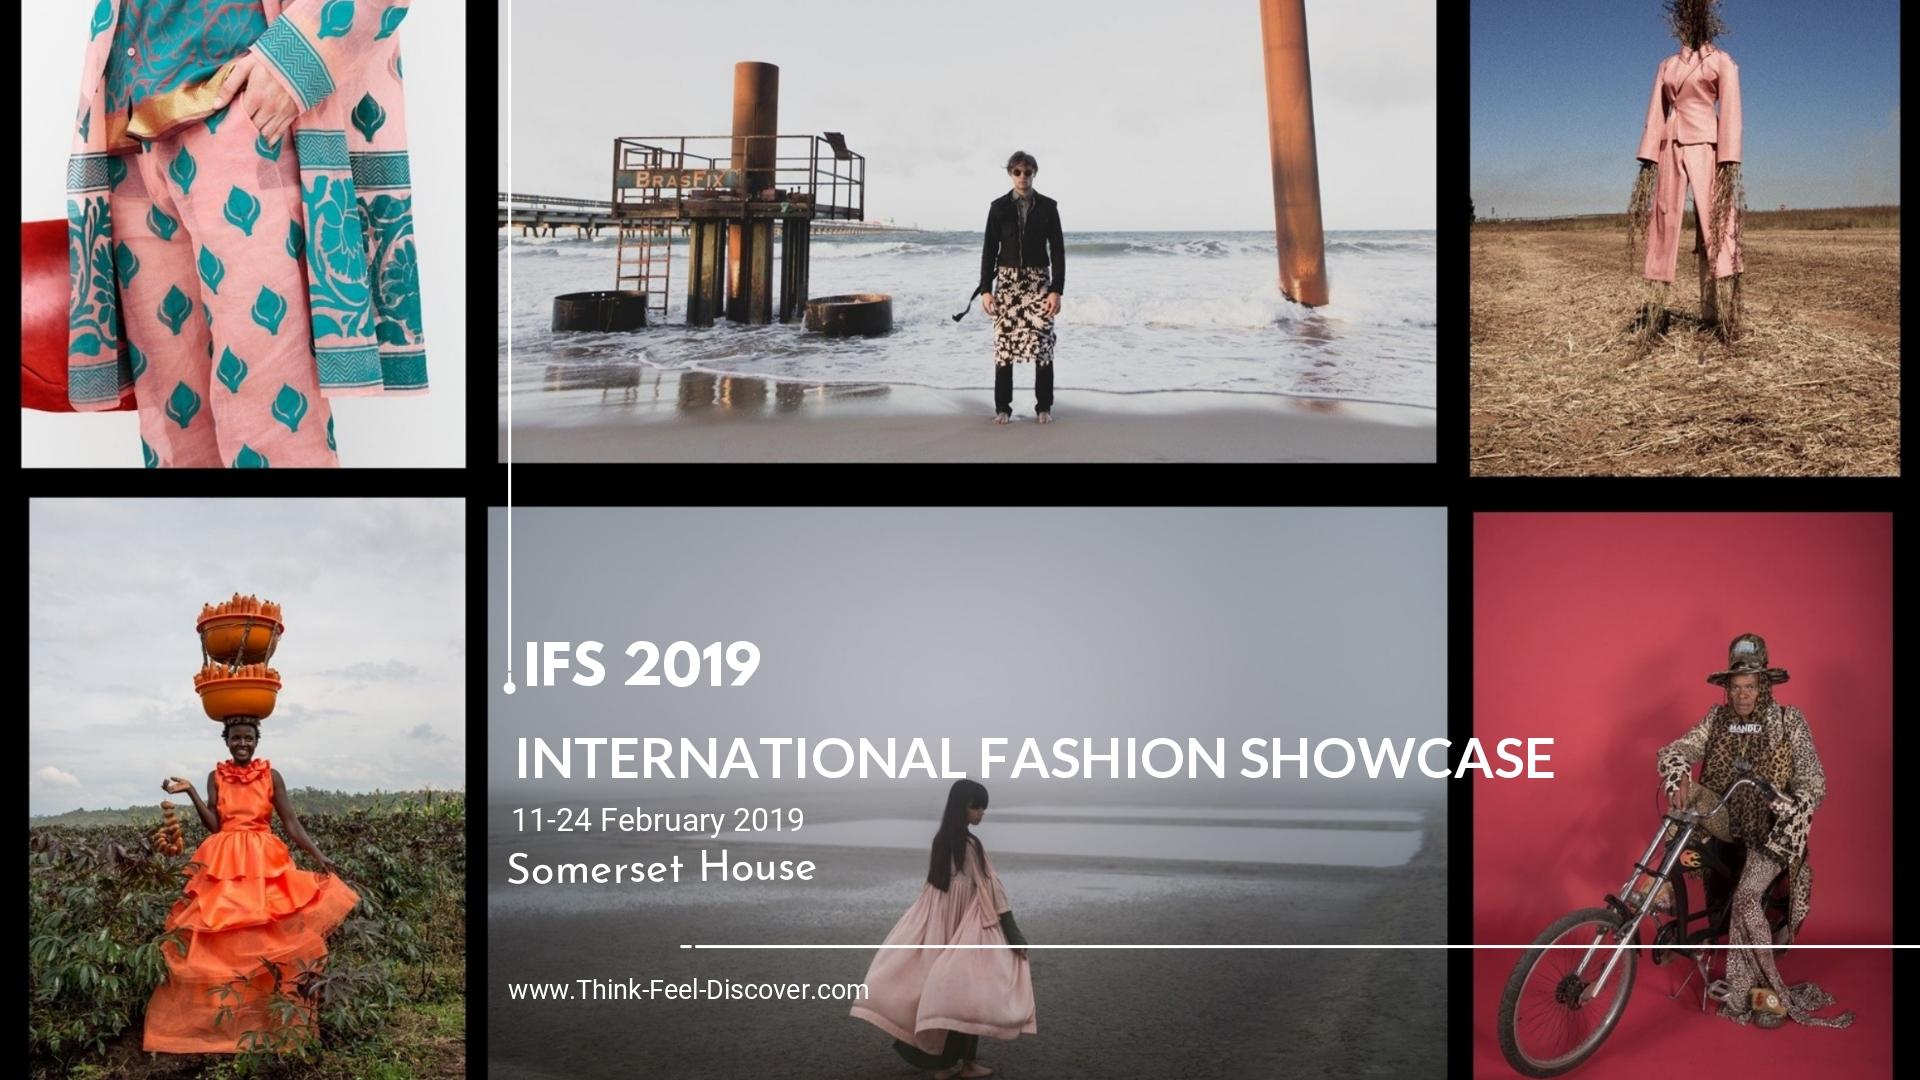 IFS 2019, Somerset House, British Council, London